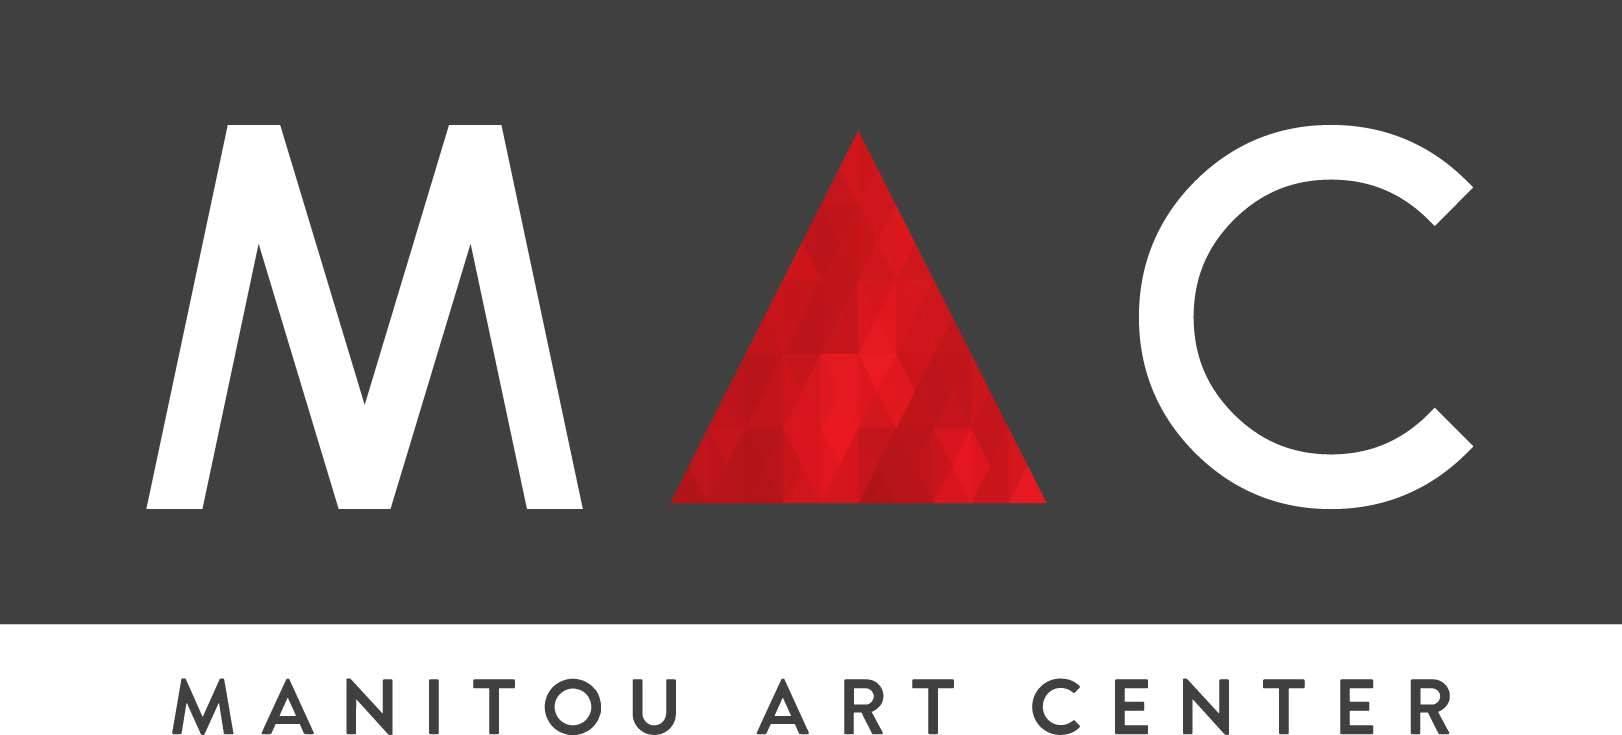 Manitou Art Center